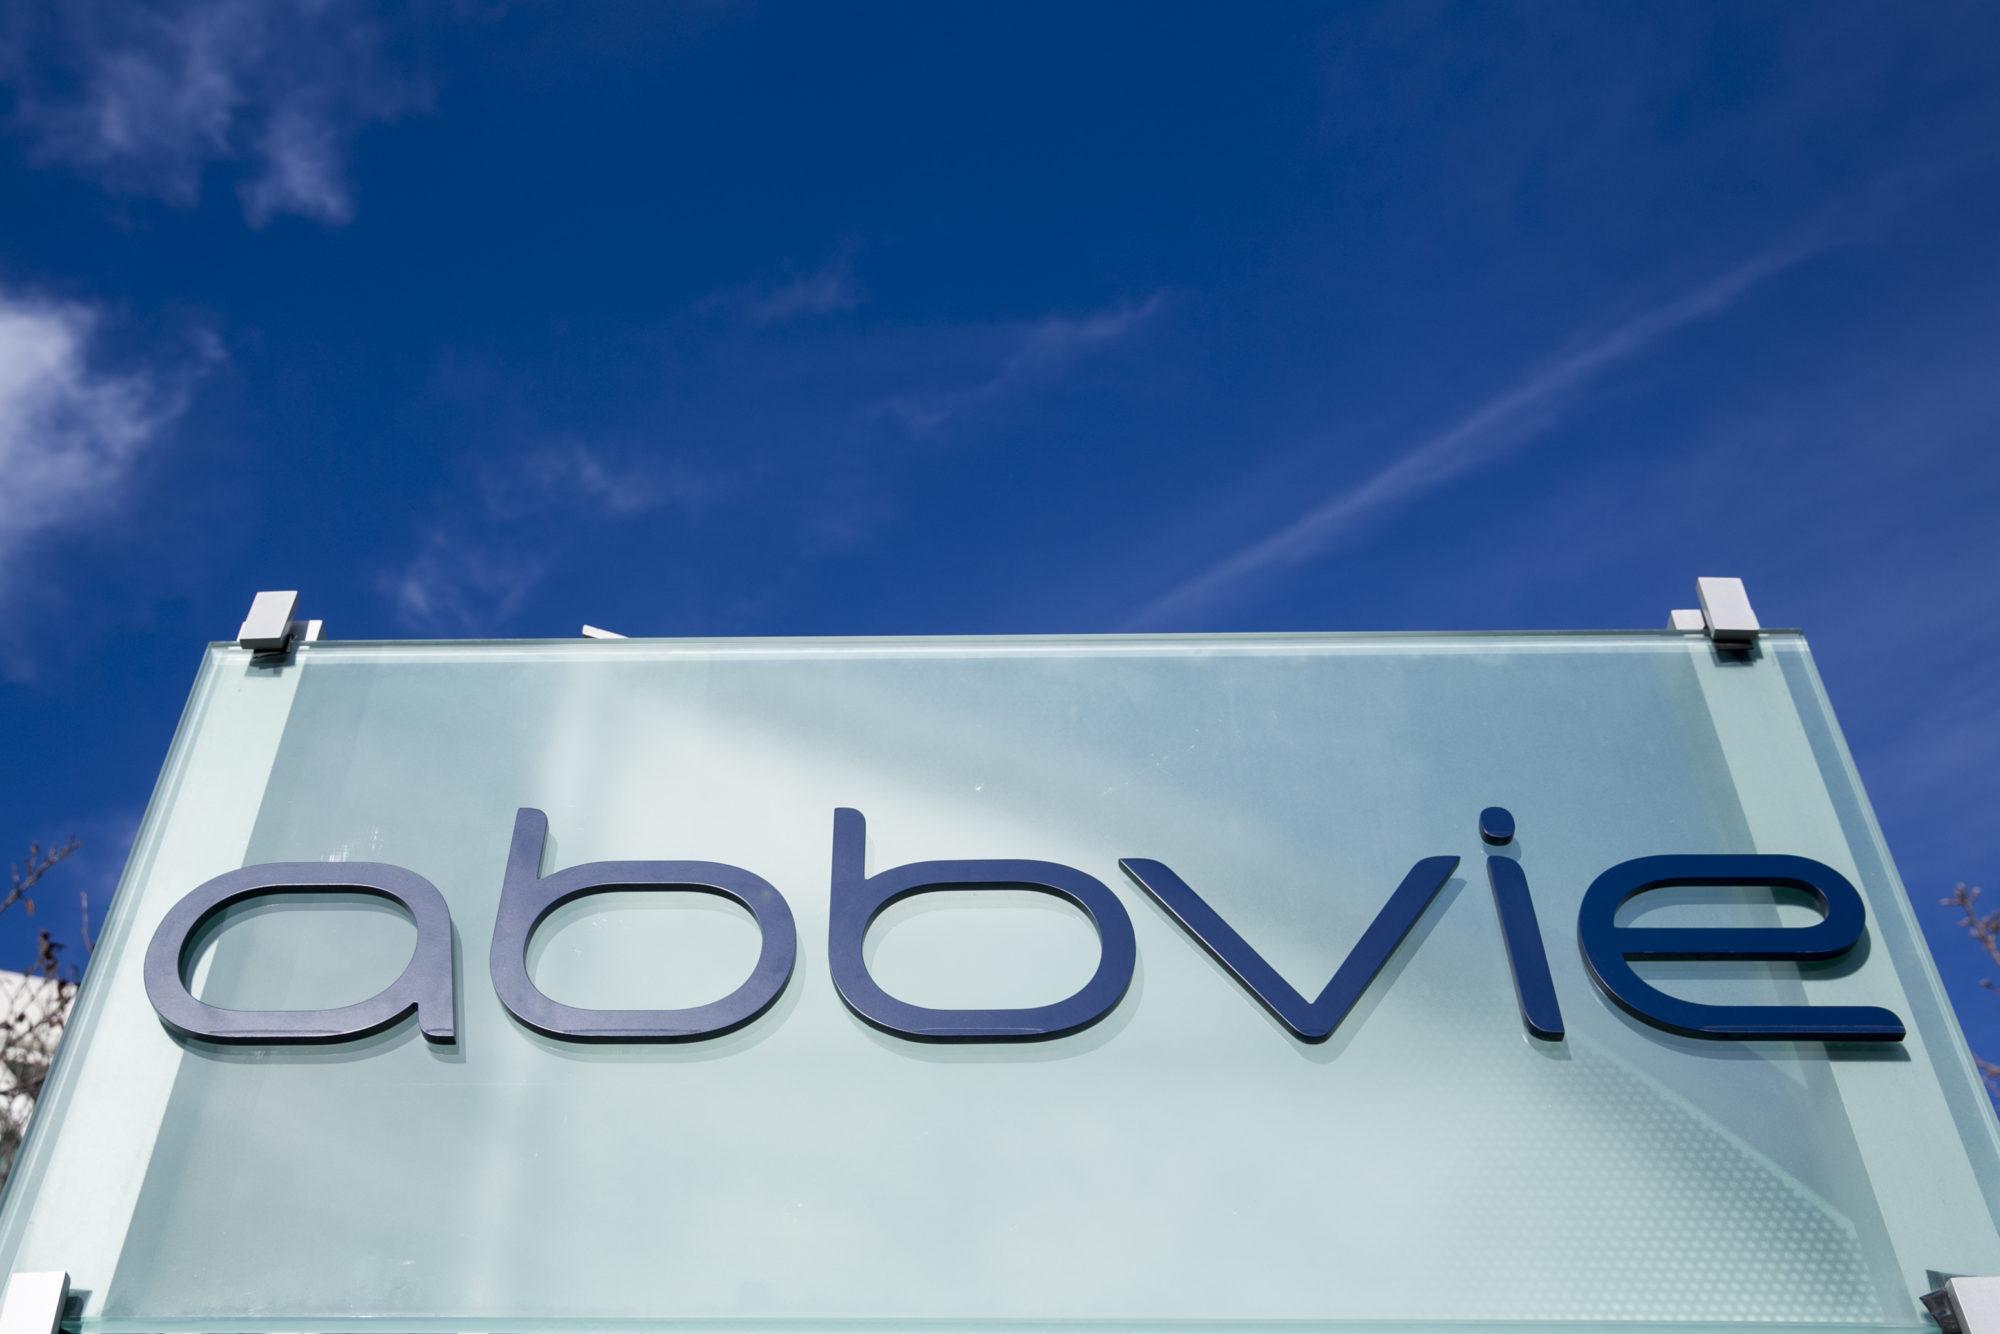 AbbVie: H AbbVie αναδεικνύεται ως μία από τις 20 πιο αξιοθαύμαστες επιχειρήσεις στην Ελλάδα